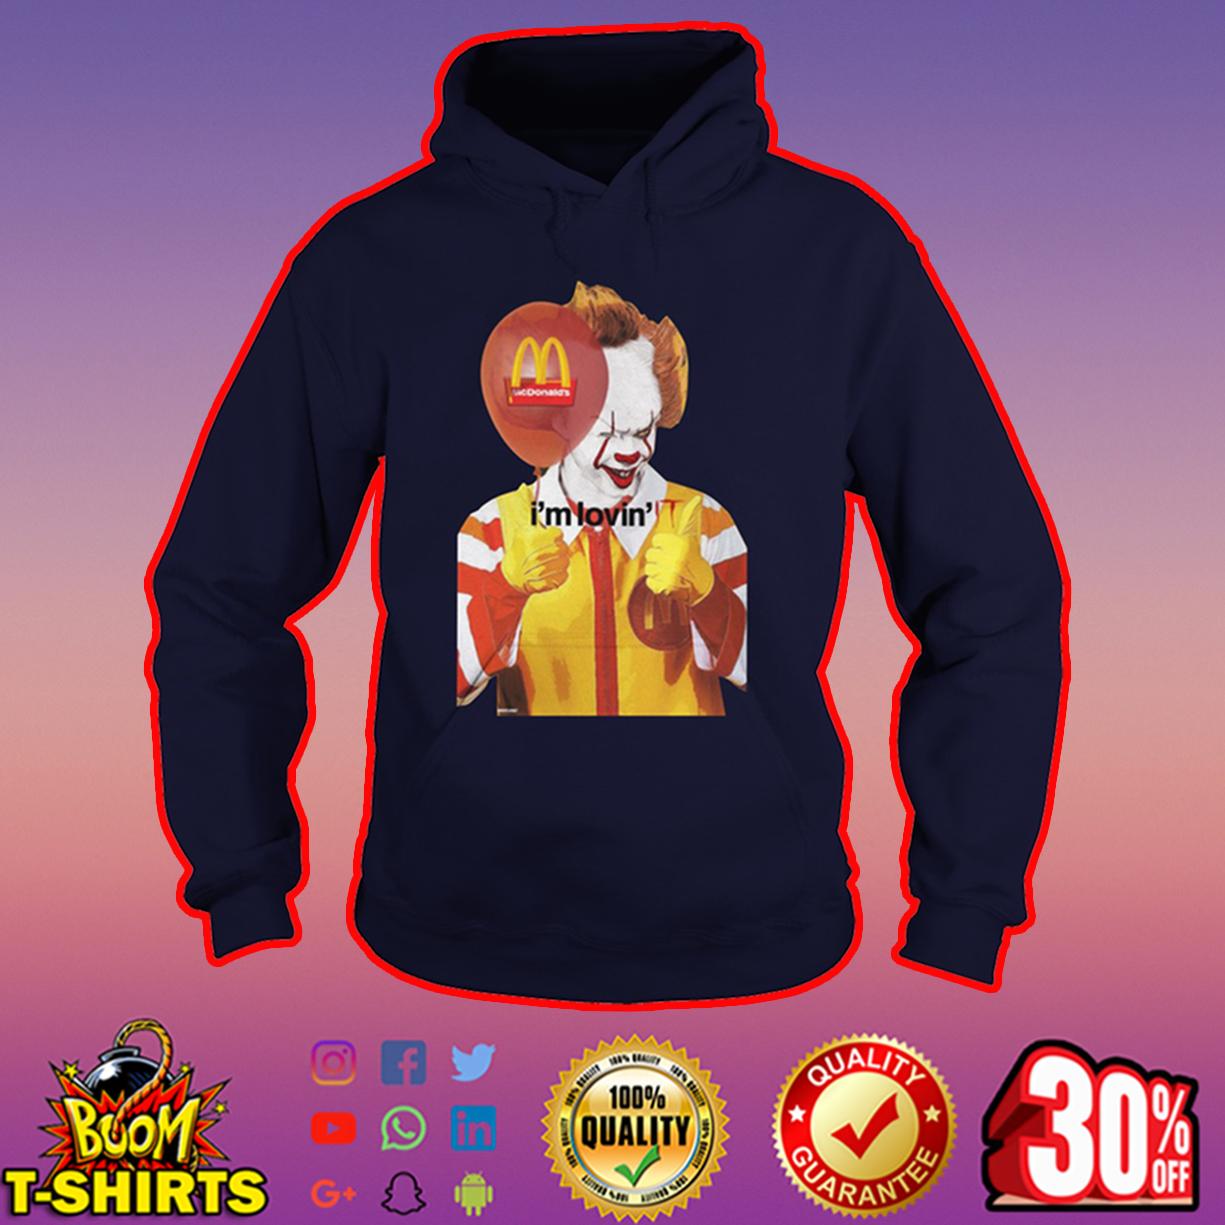 Mcdonald's I'm Lovin' IT hoodie